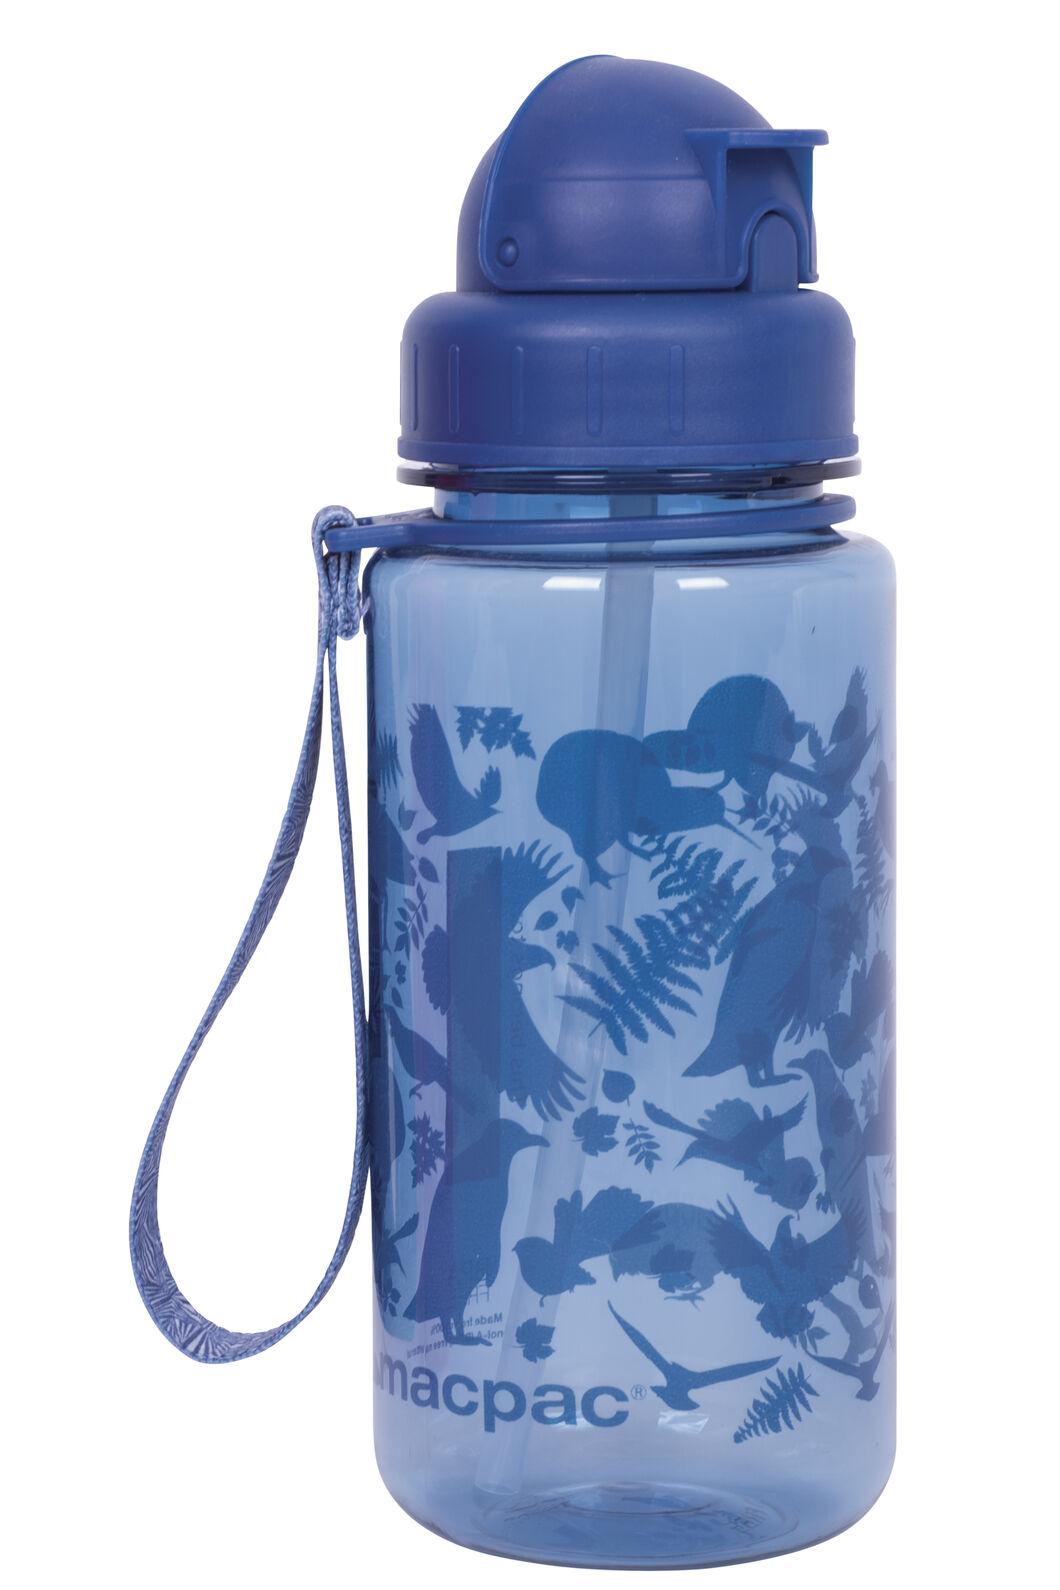 Macpac Kids' Drink Bottle — 400 ml, Bluebird, hi-res